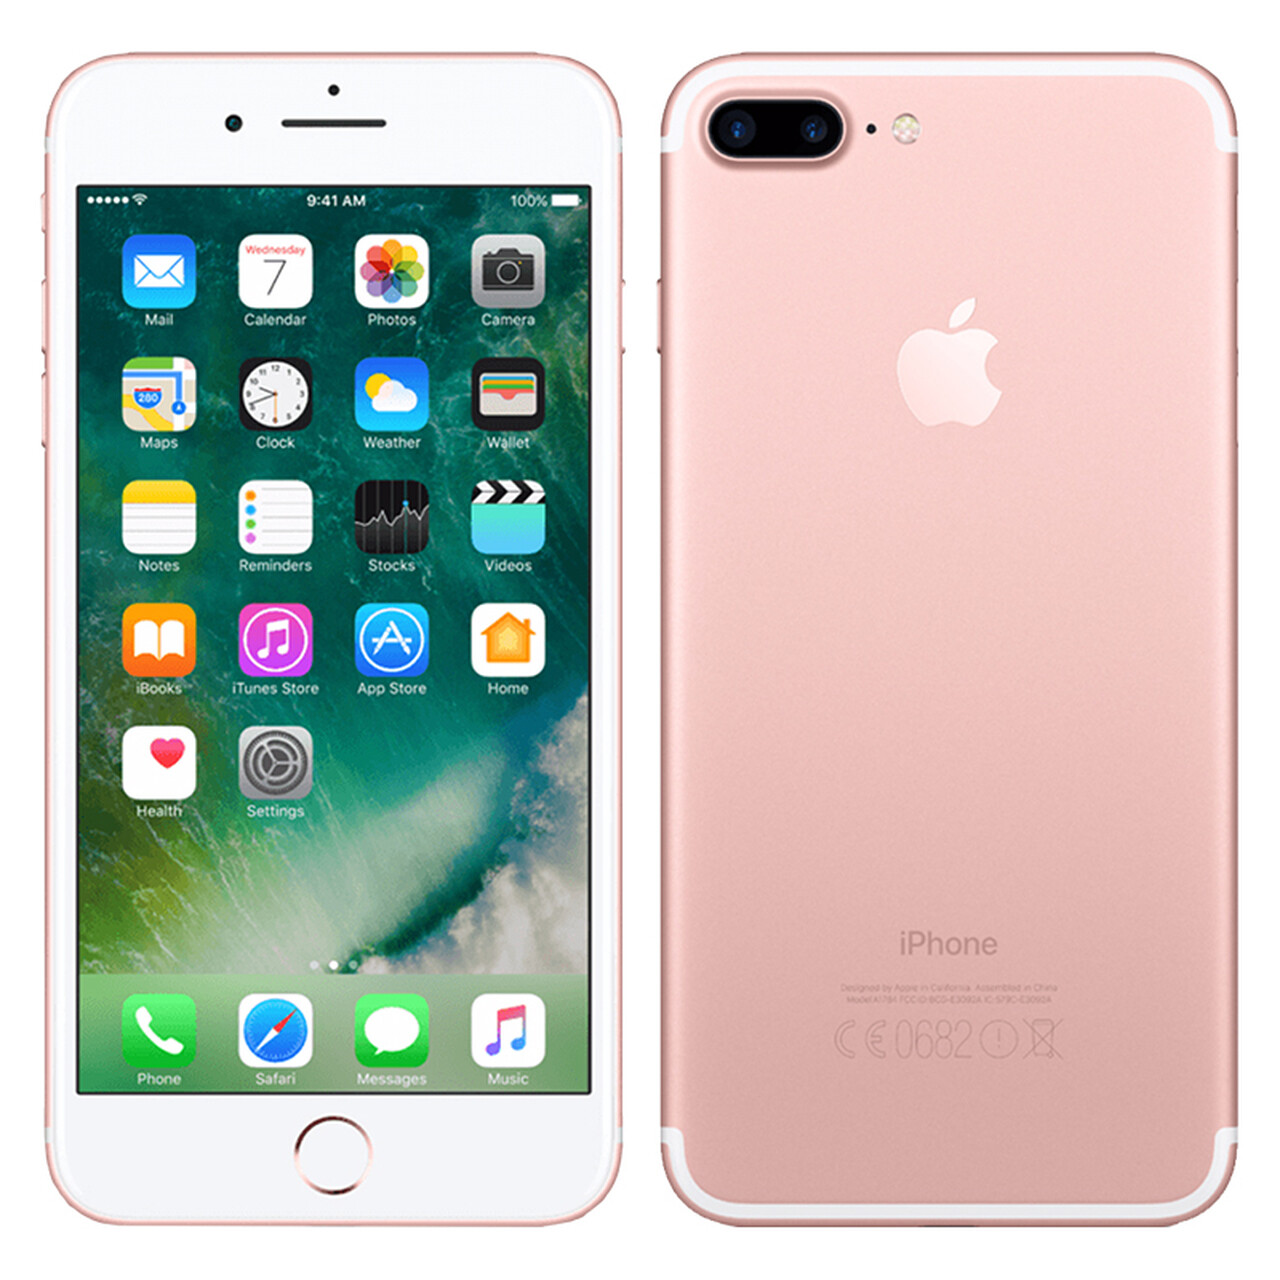 Iphone 7 Plus 32GB (Unlocked)